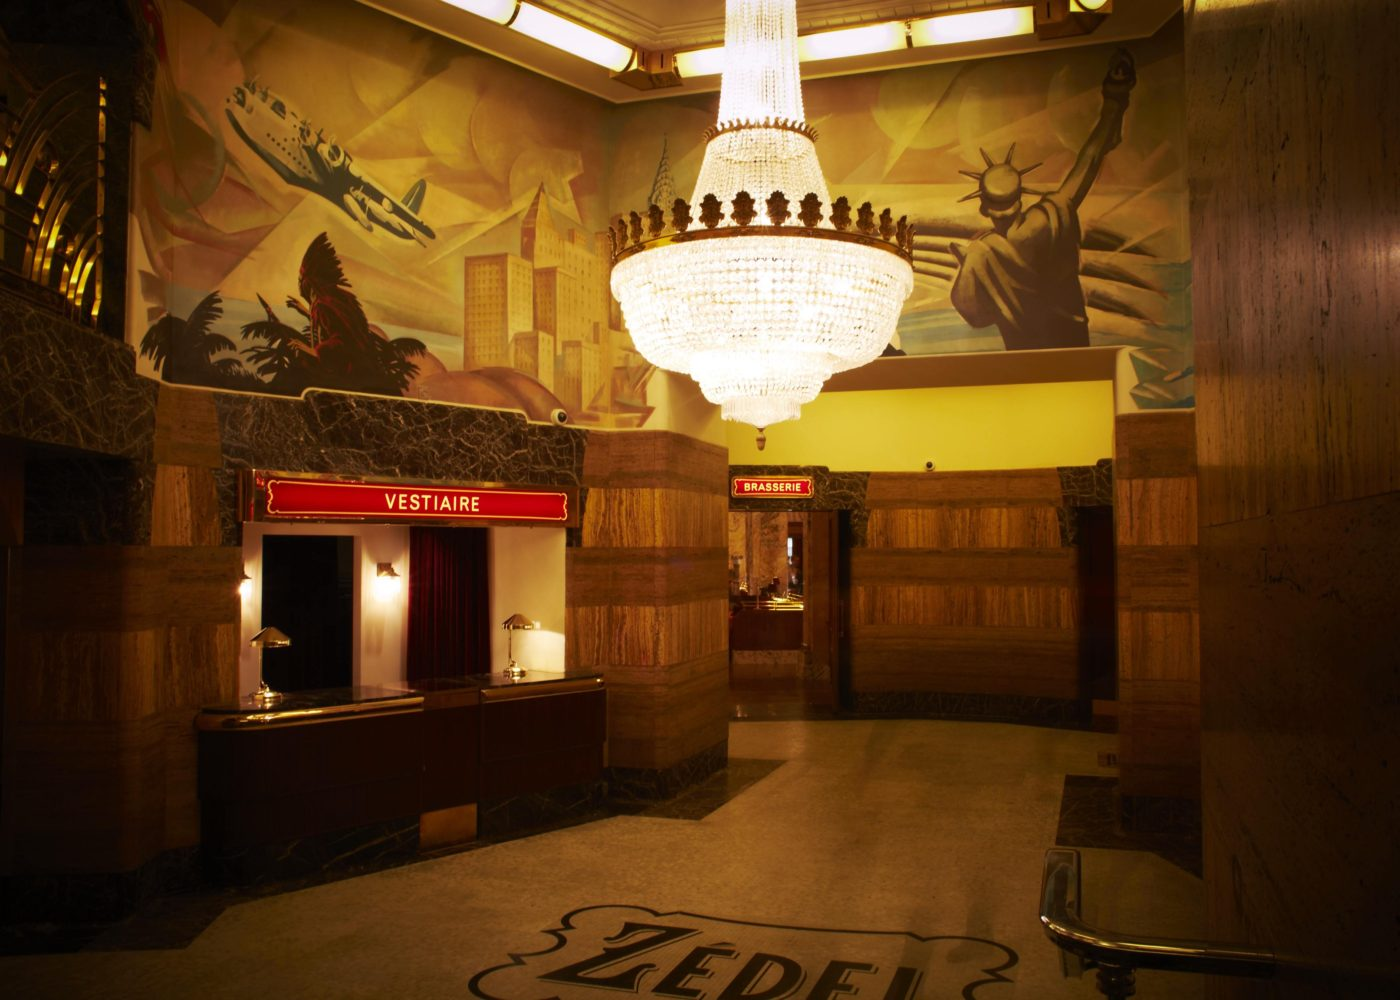 Zedel Foyer